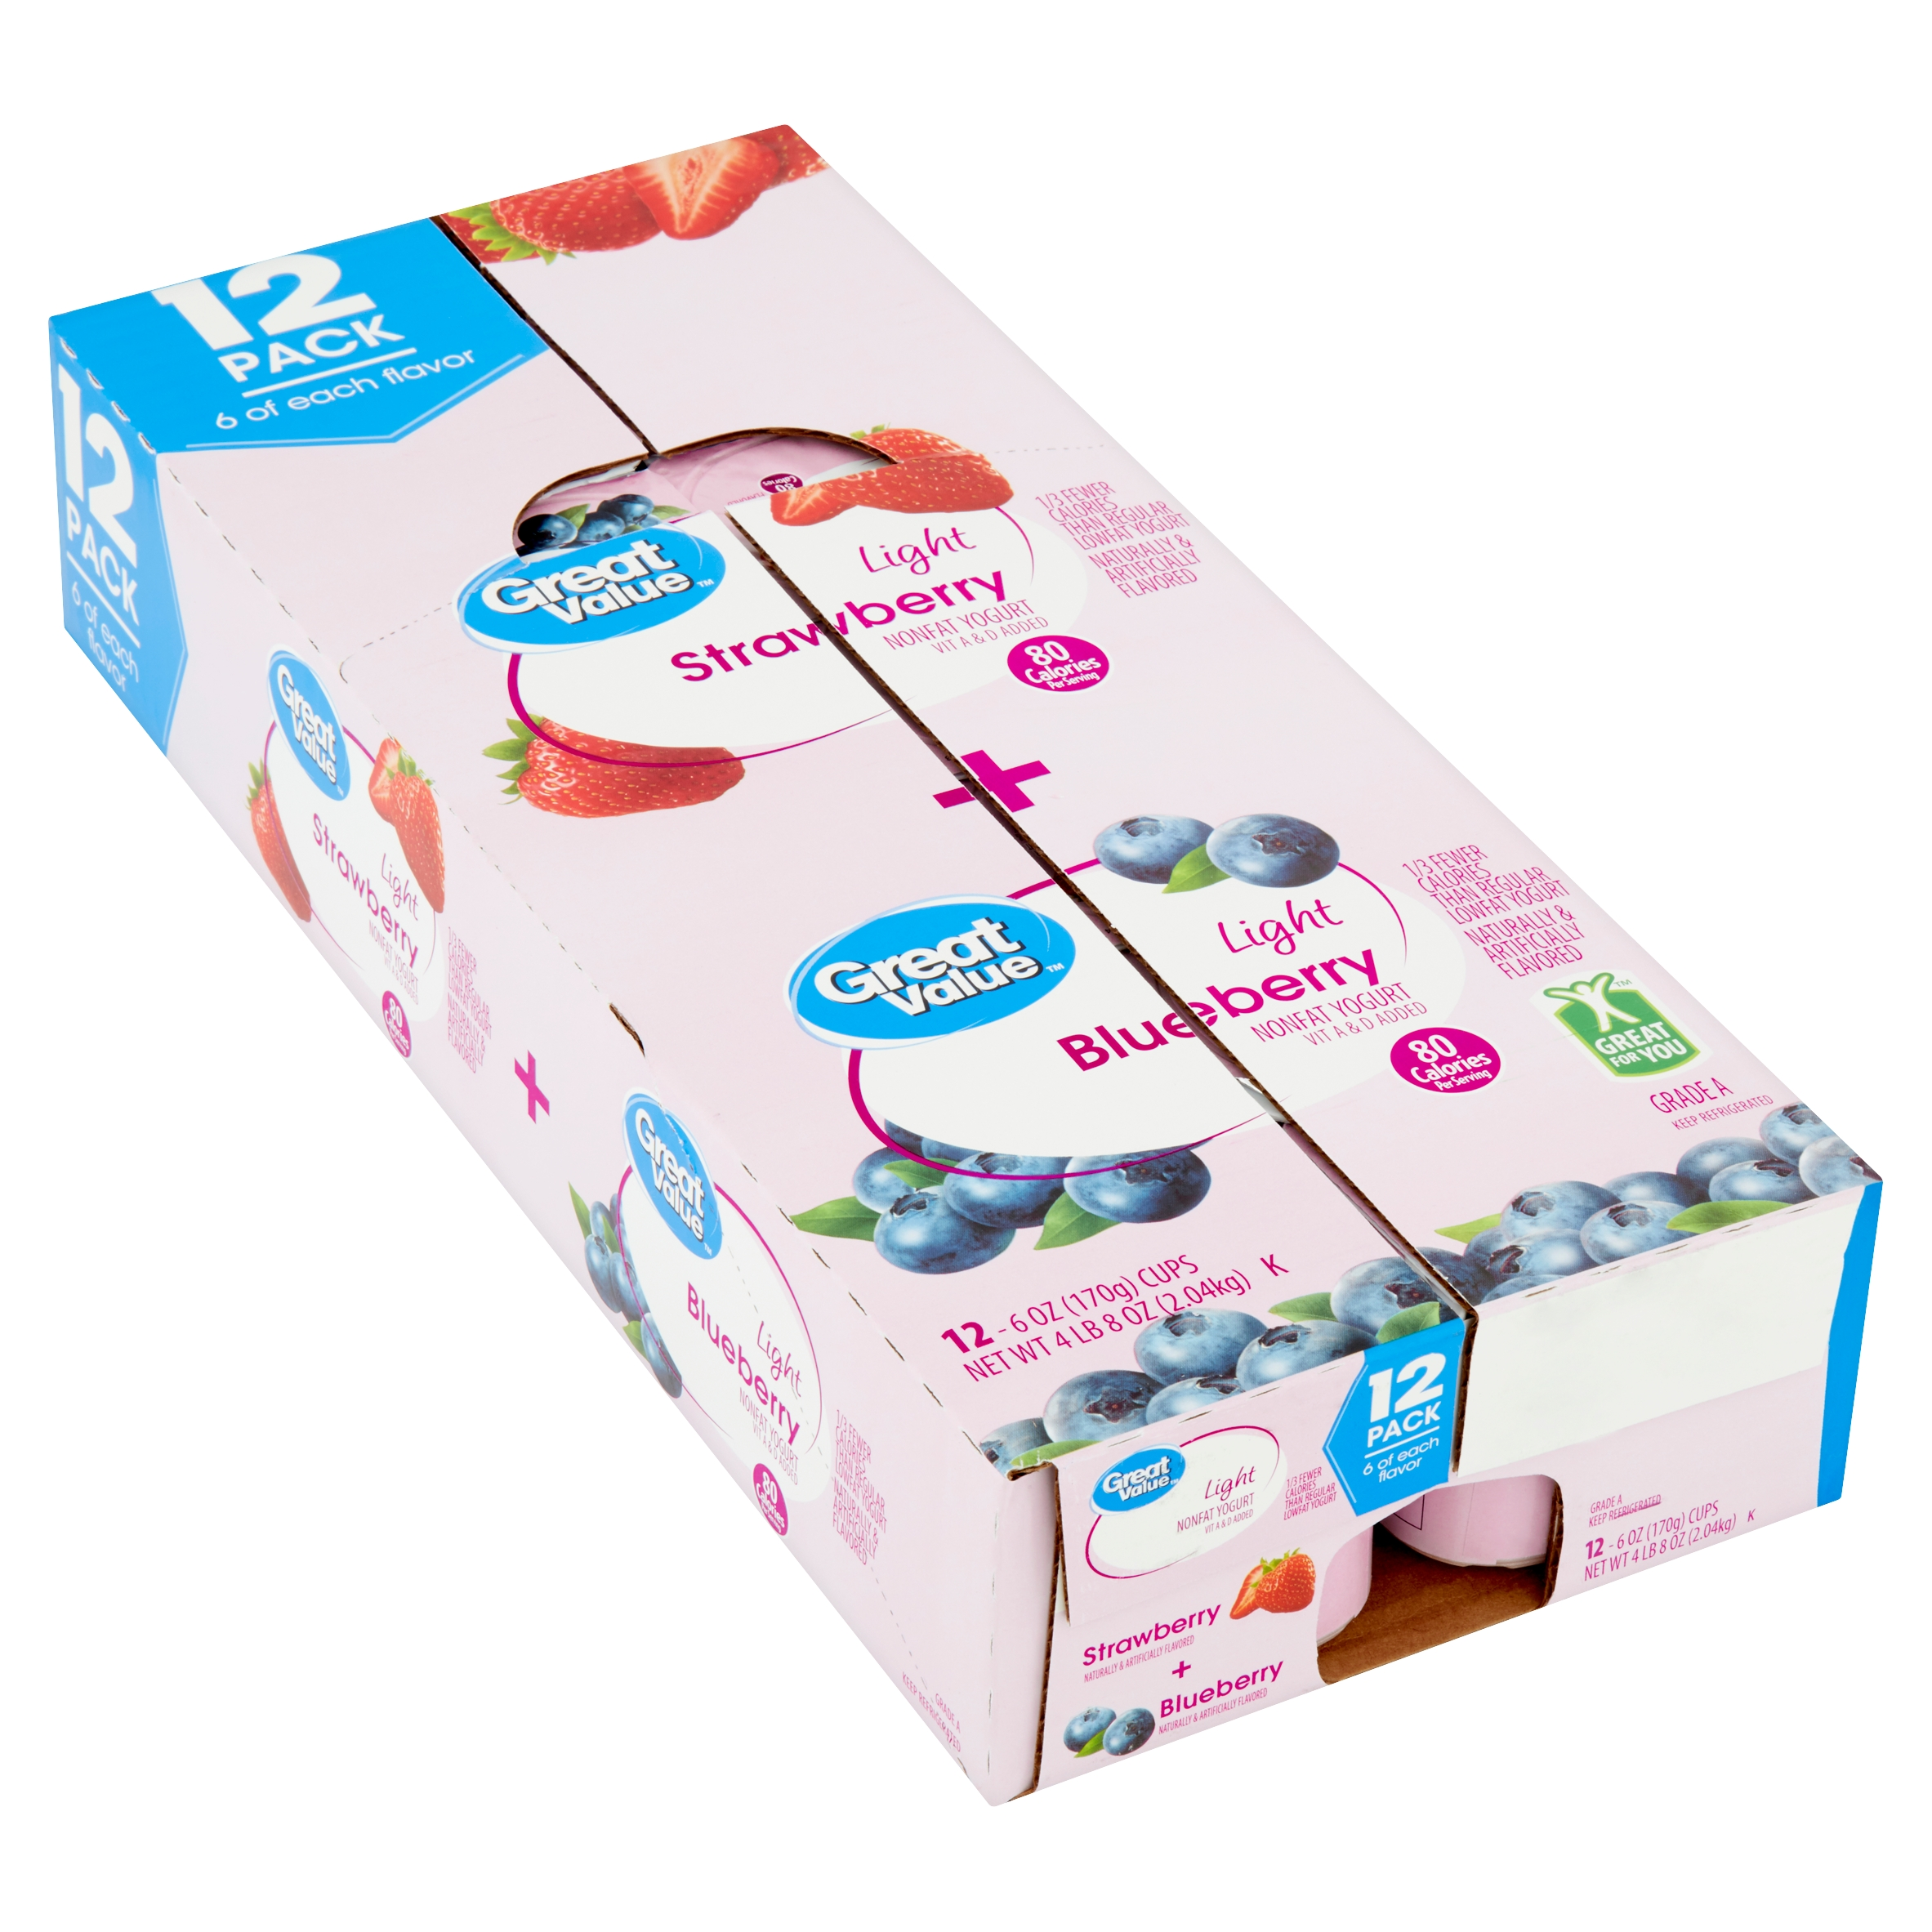 Great Value Light Strawberry + Blueberry Nonfat Yogurt, 6 oz, 12 count